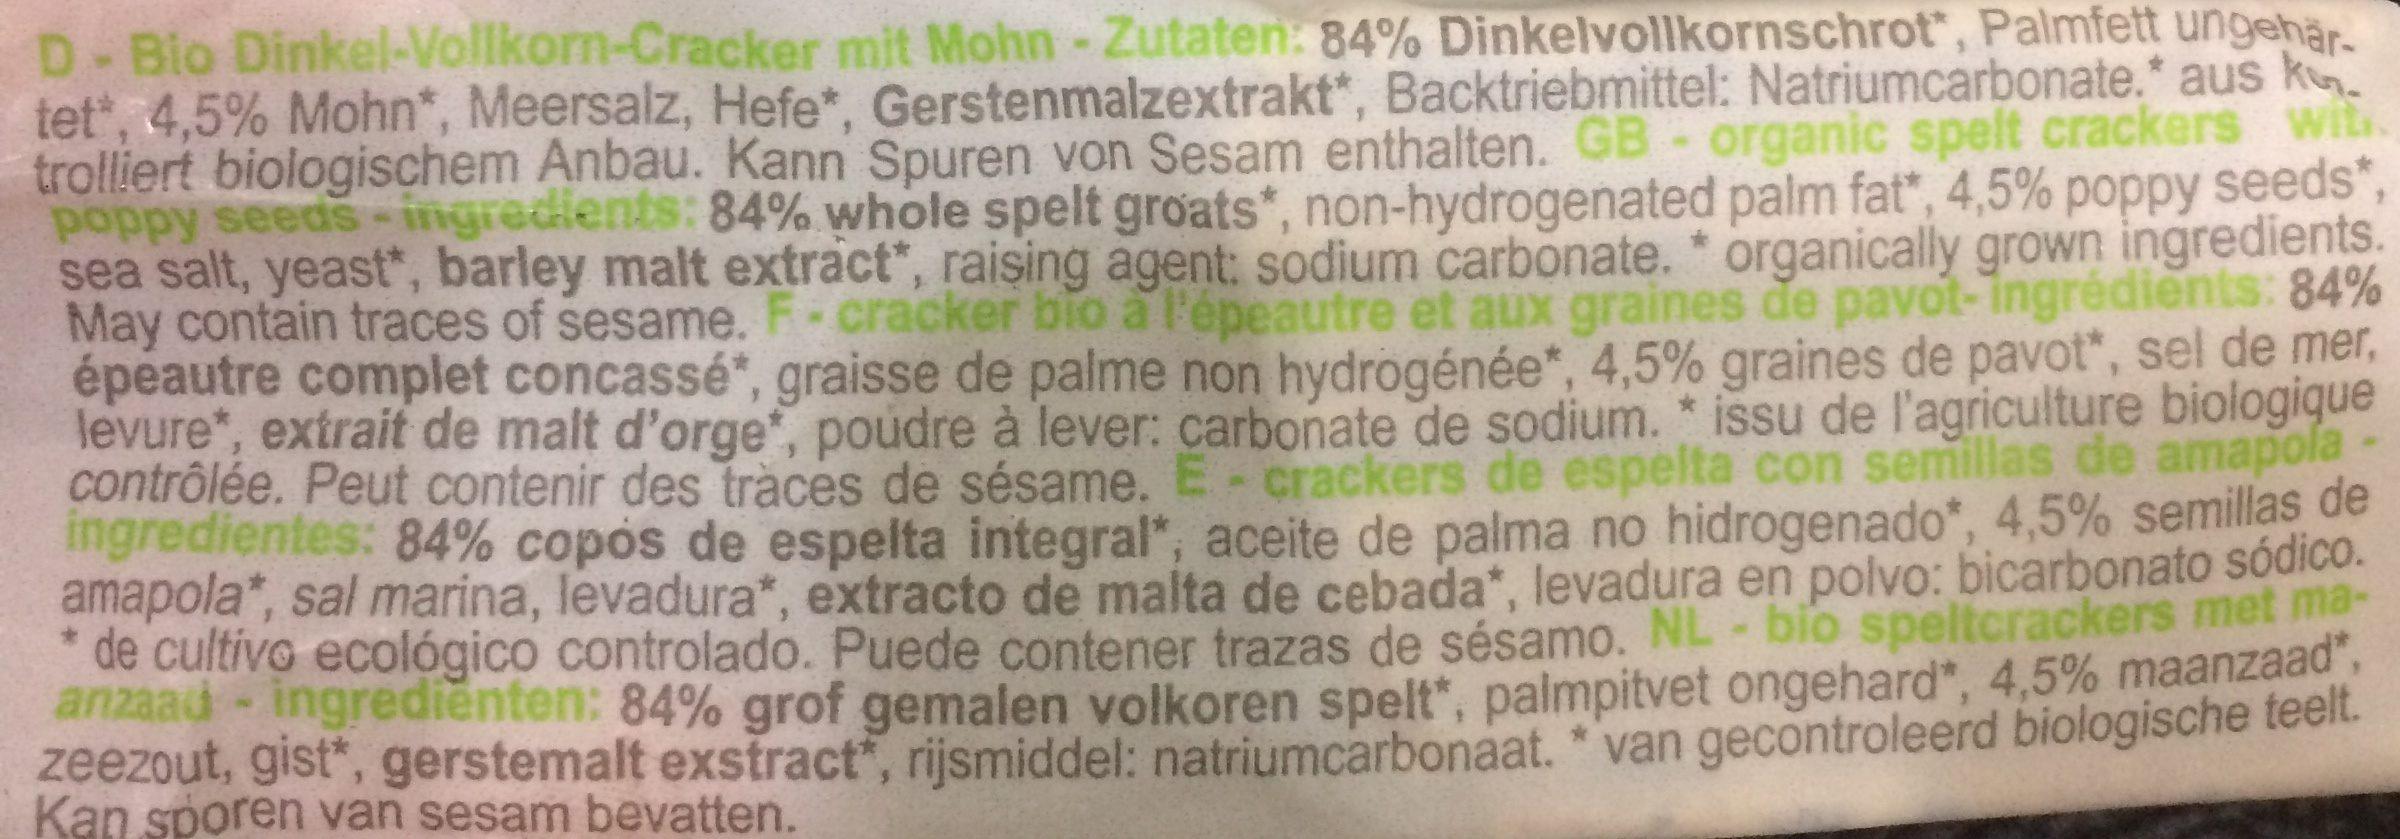 Cracker Epeautre Pavot - Ingredients